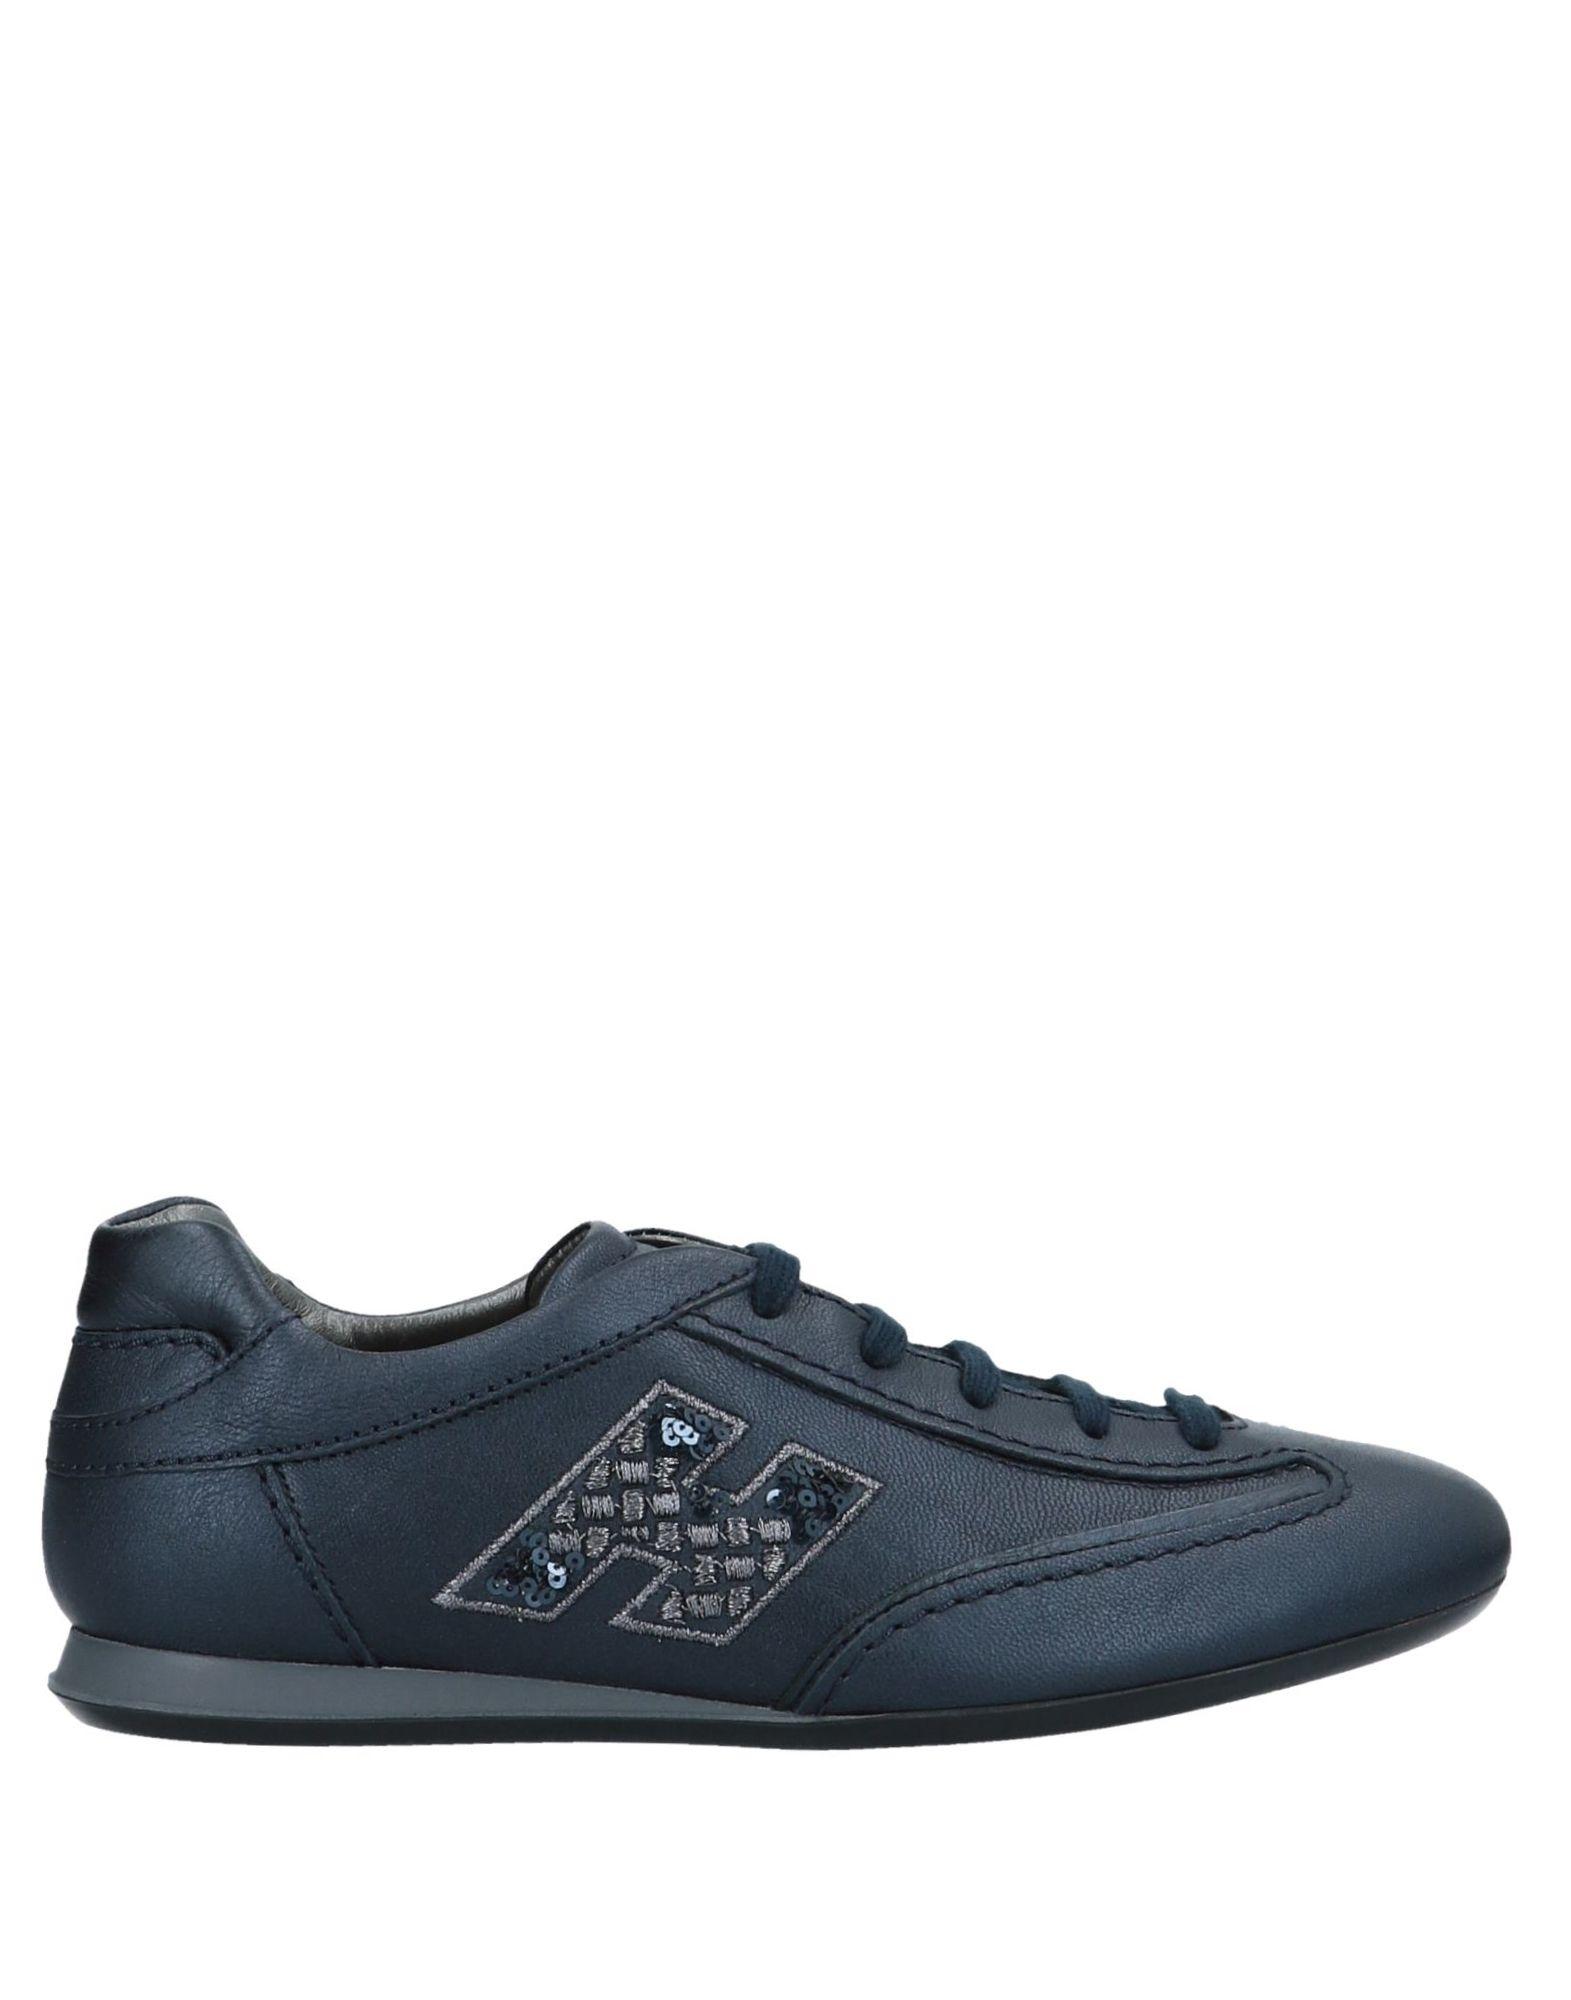 Sneakers Hogan Donna - 11567710OU elegante